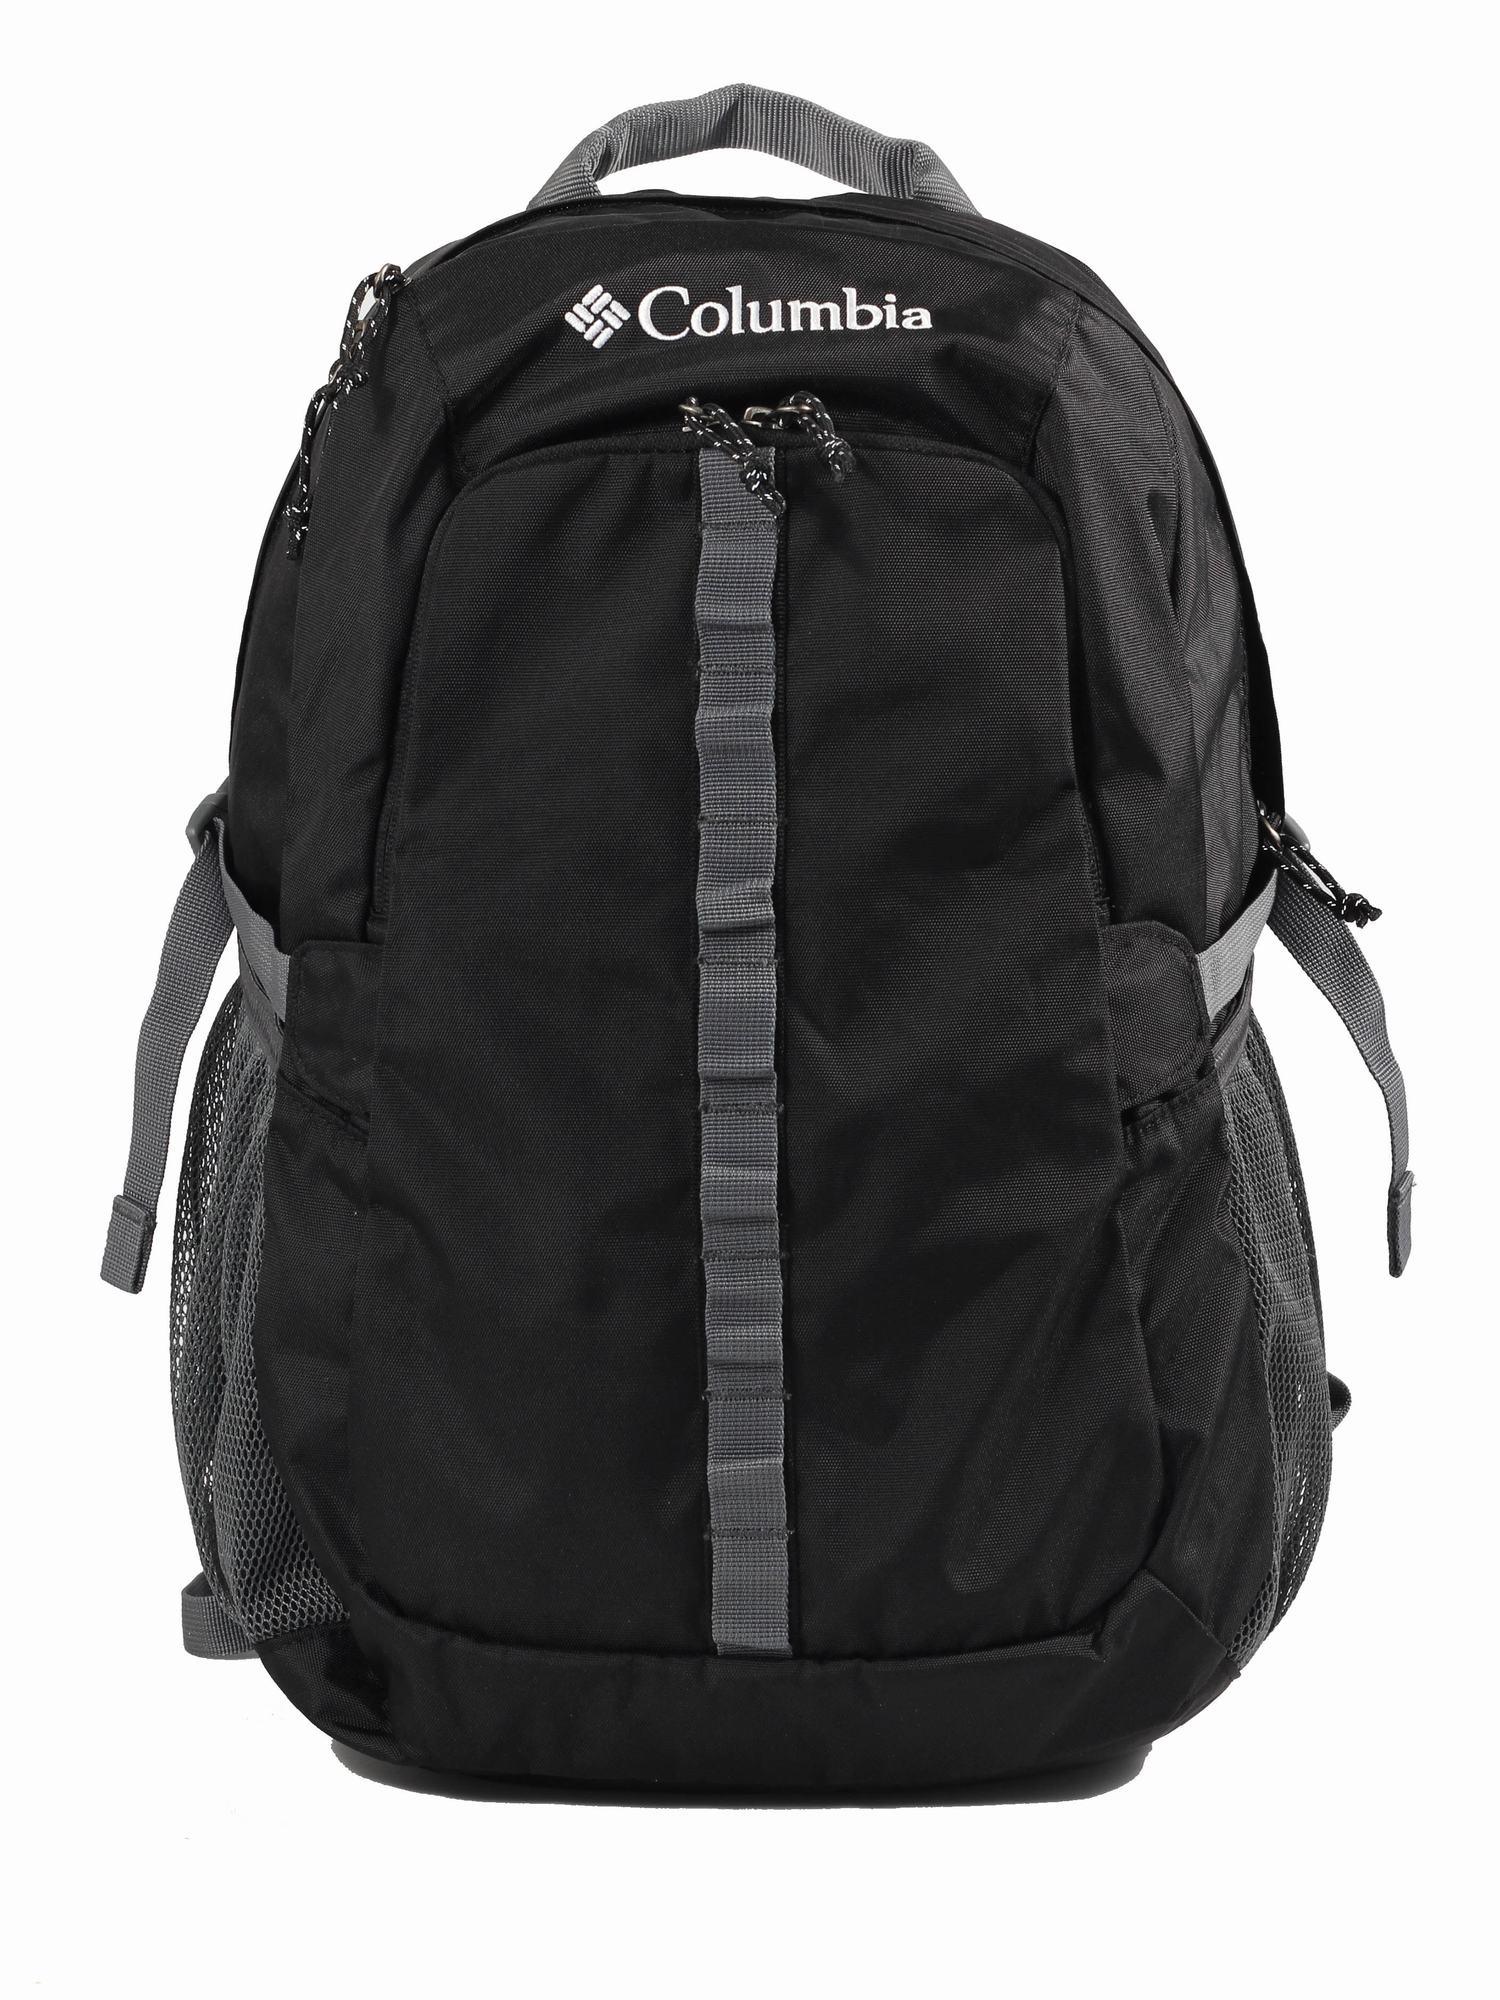 Columbia Thunderlan 112828 - Balo laptop - Shop Balo Hàng Hiệu